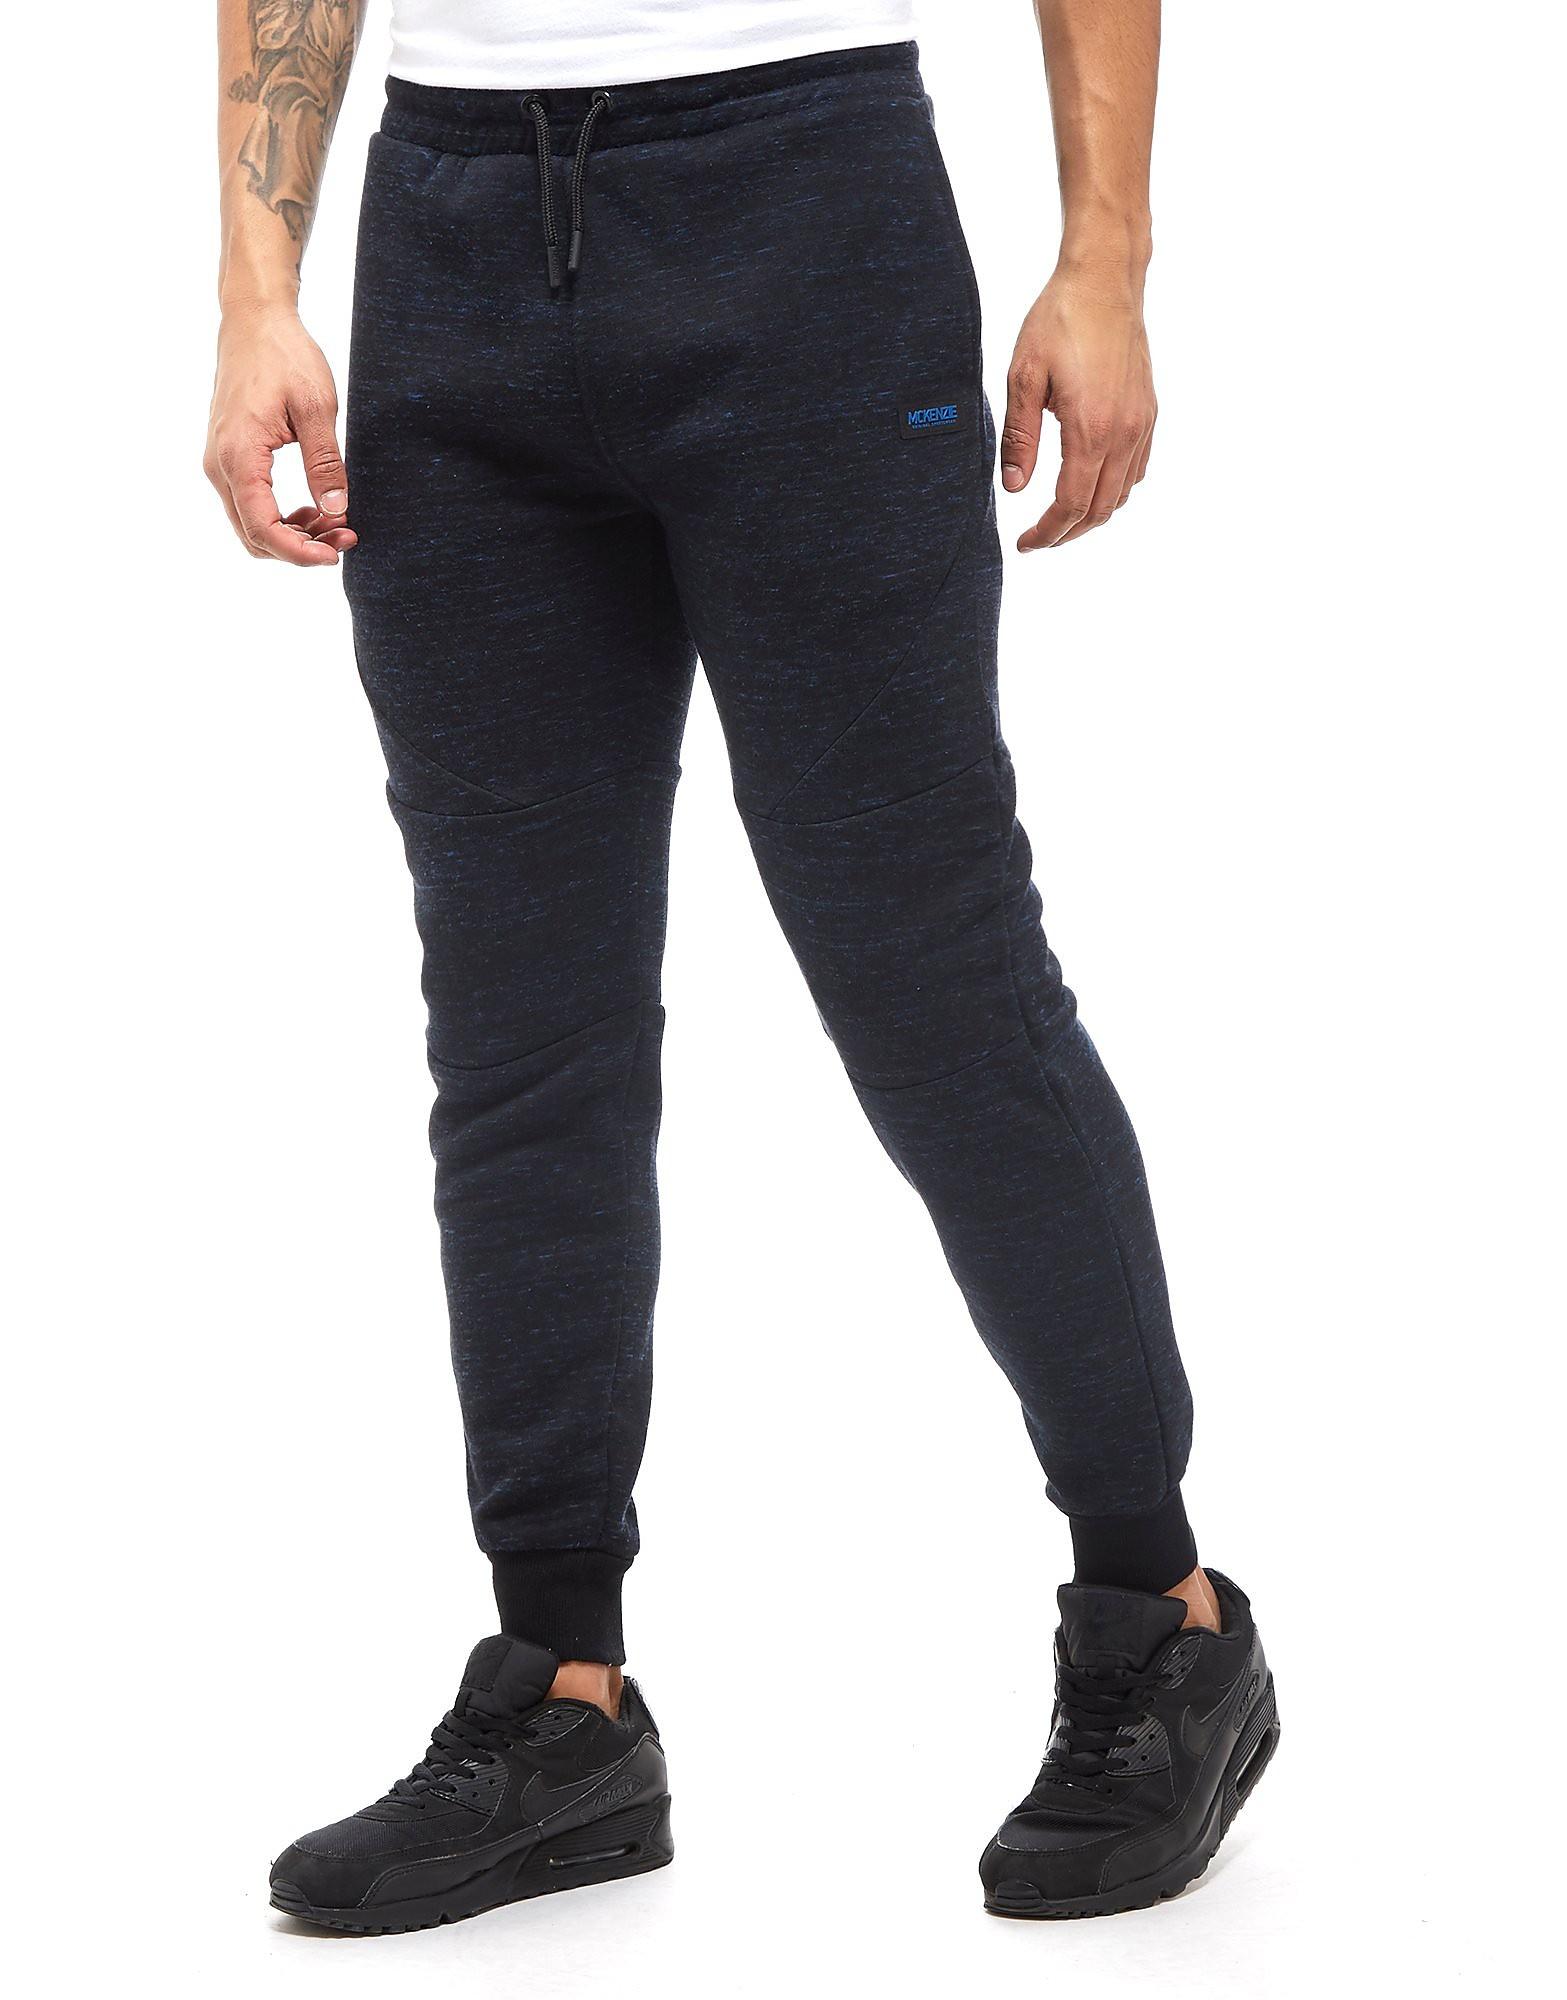 McKenzie Pantalon Horus Homme - Only at JD - noir/bleu, noir/bleu